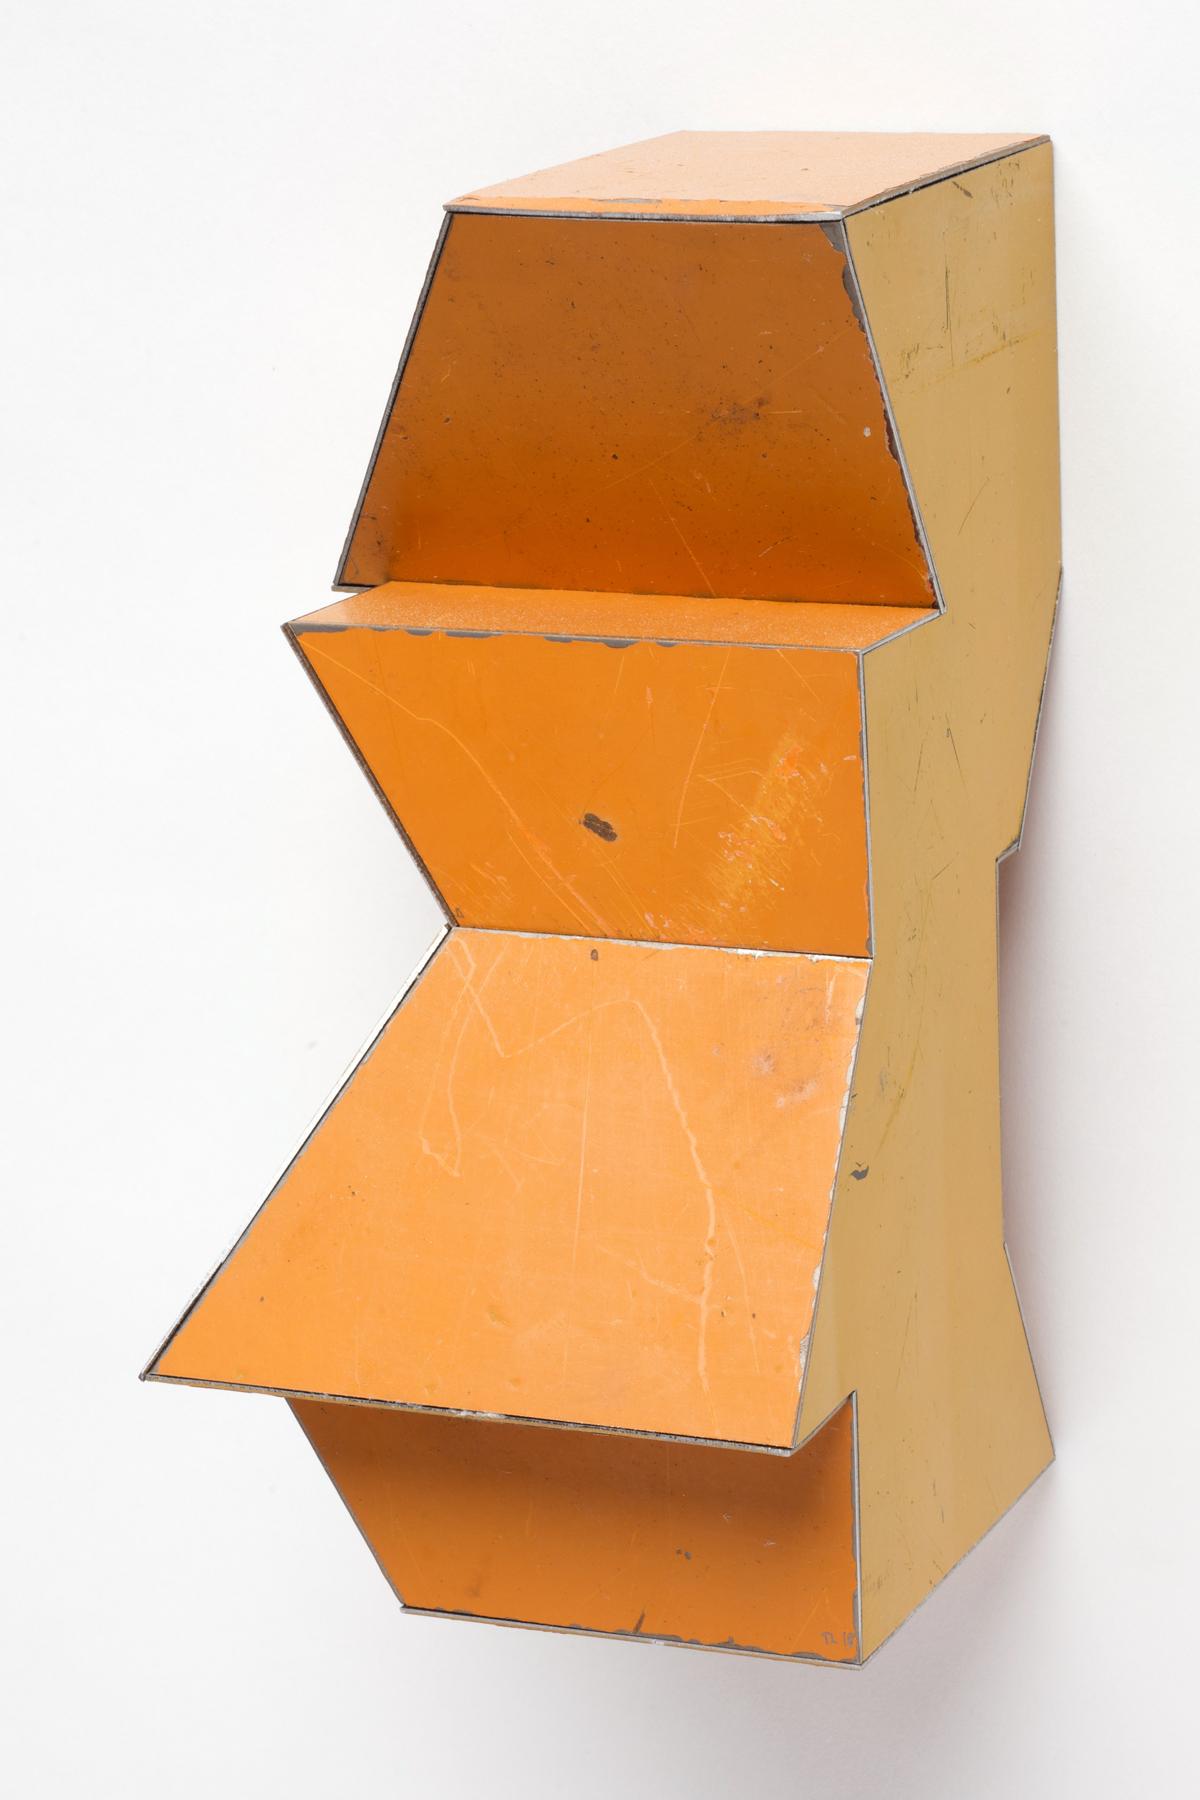 Single Copy, 7.5 x 3.5 x 4 inches / 19 x 8.9 x 10.2 cm, salvage steel, marine-grade plywood, silicone, vulcanized rubber, hardware, 2018